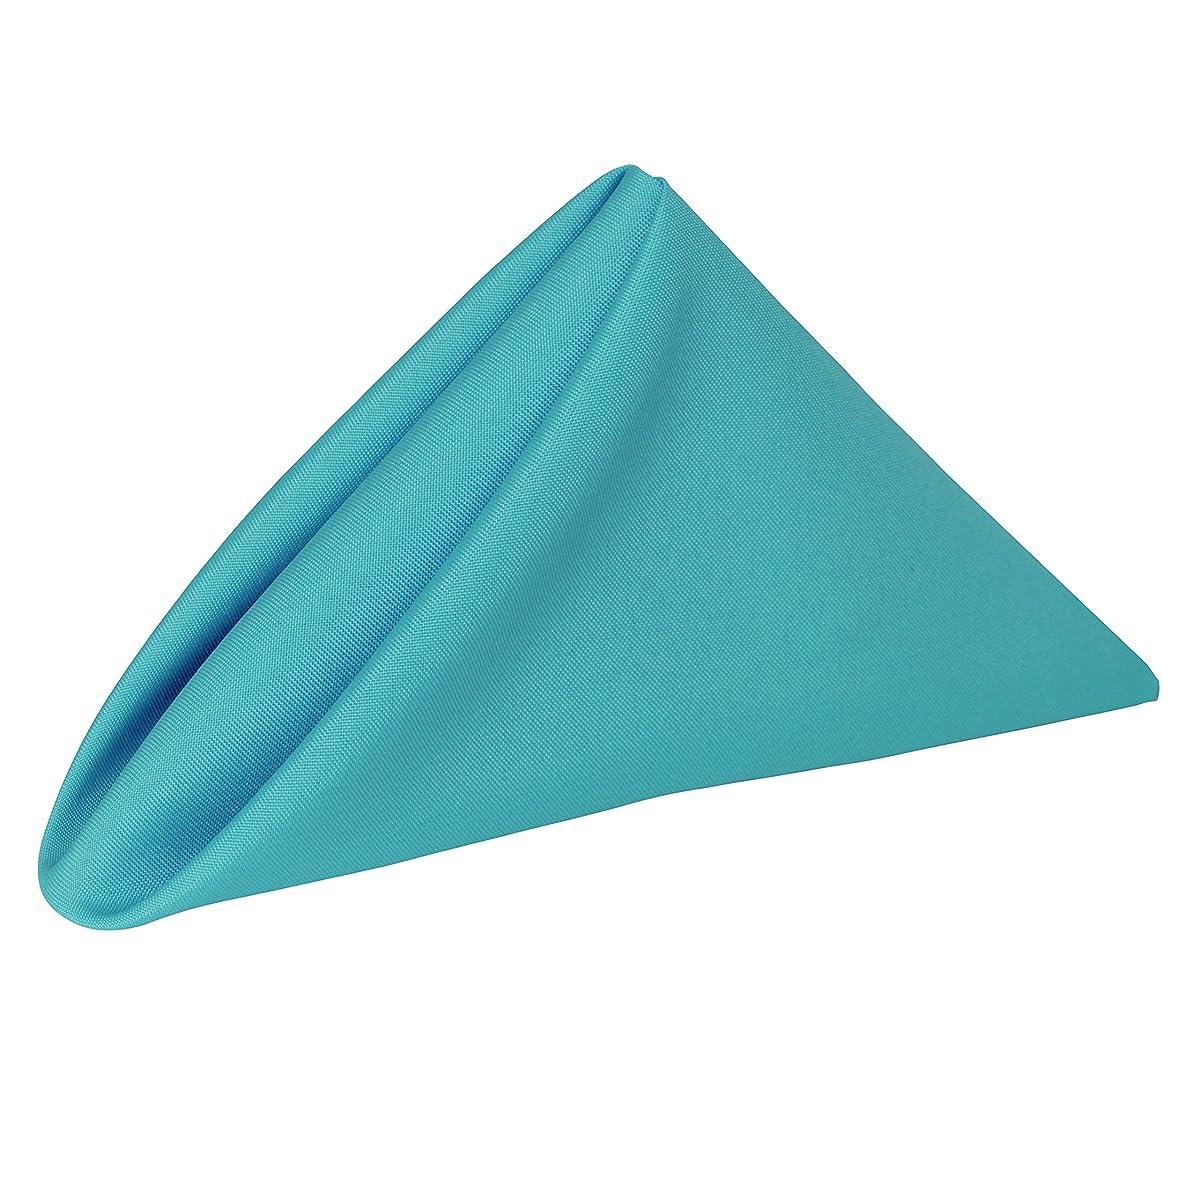 Ultimate Textile -1 Dozen- 17 x 17-Inch Polyester Cloth Napkins Turquoise Blue